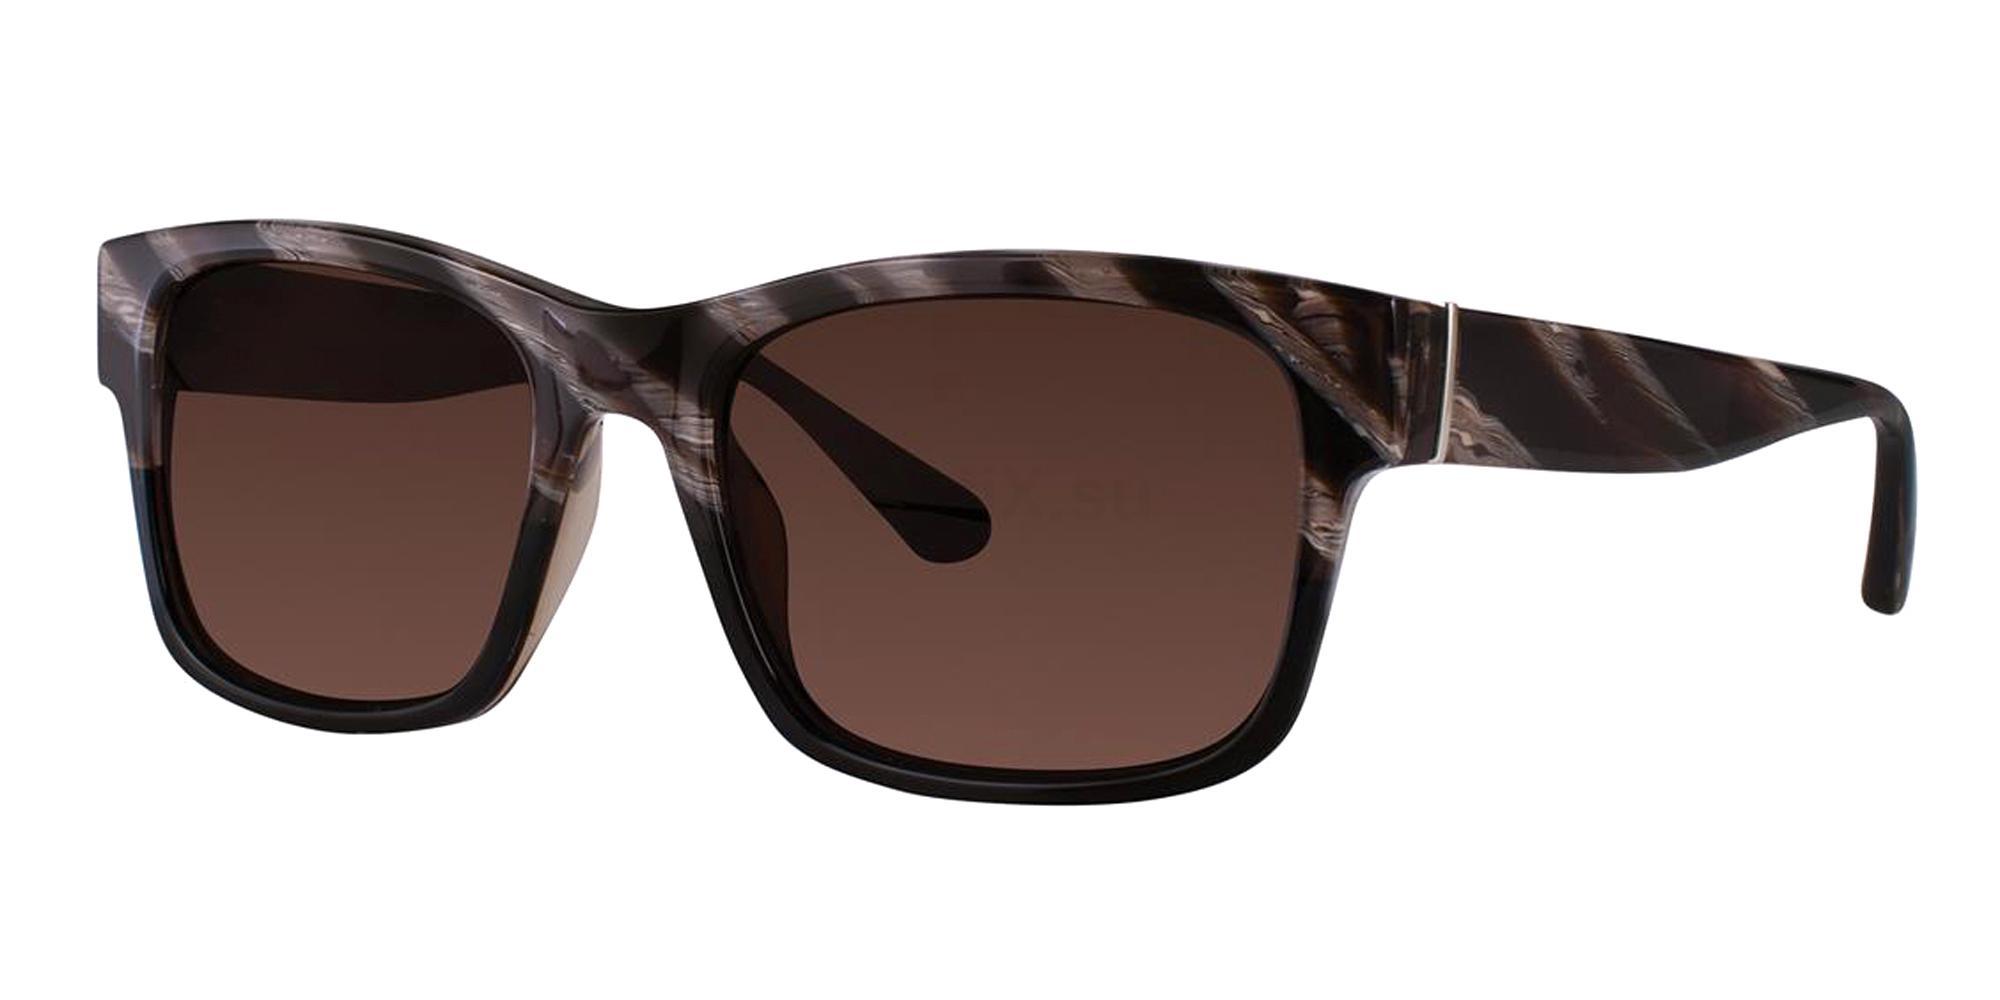 Black Horn CULVER Sunglasses, Zac Posen